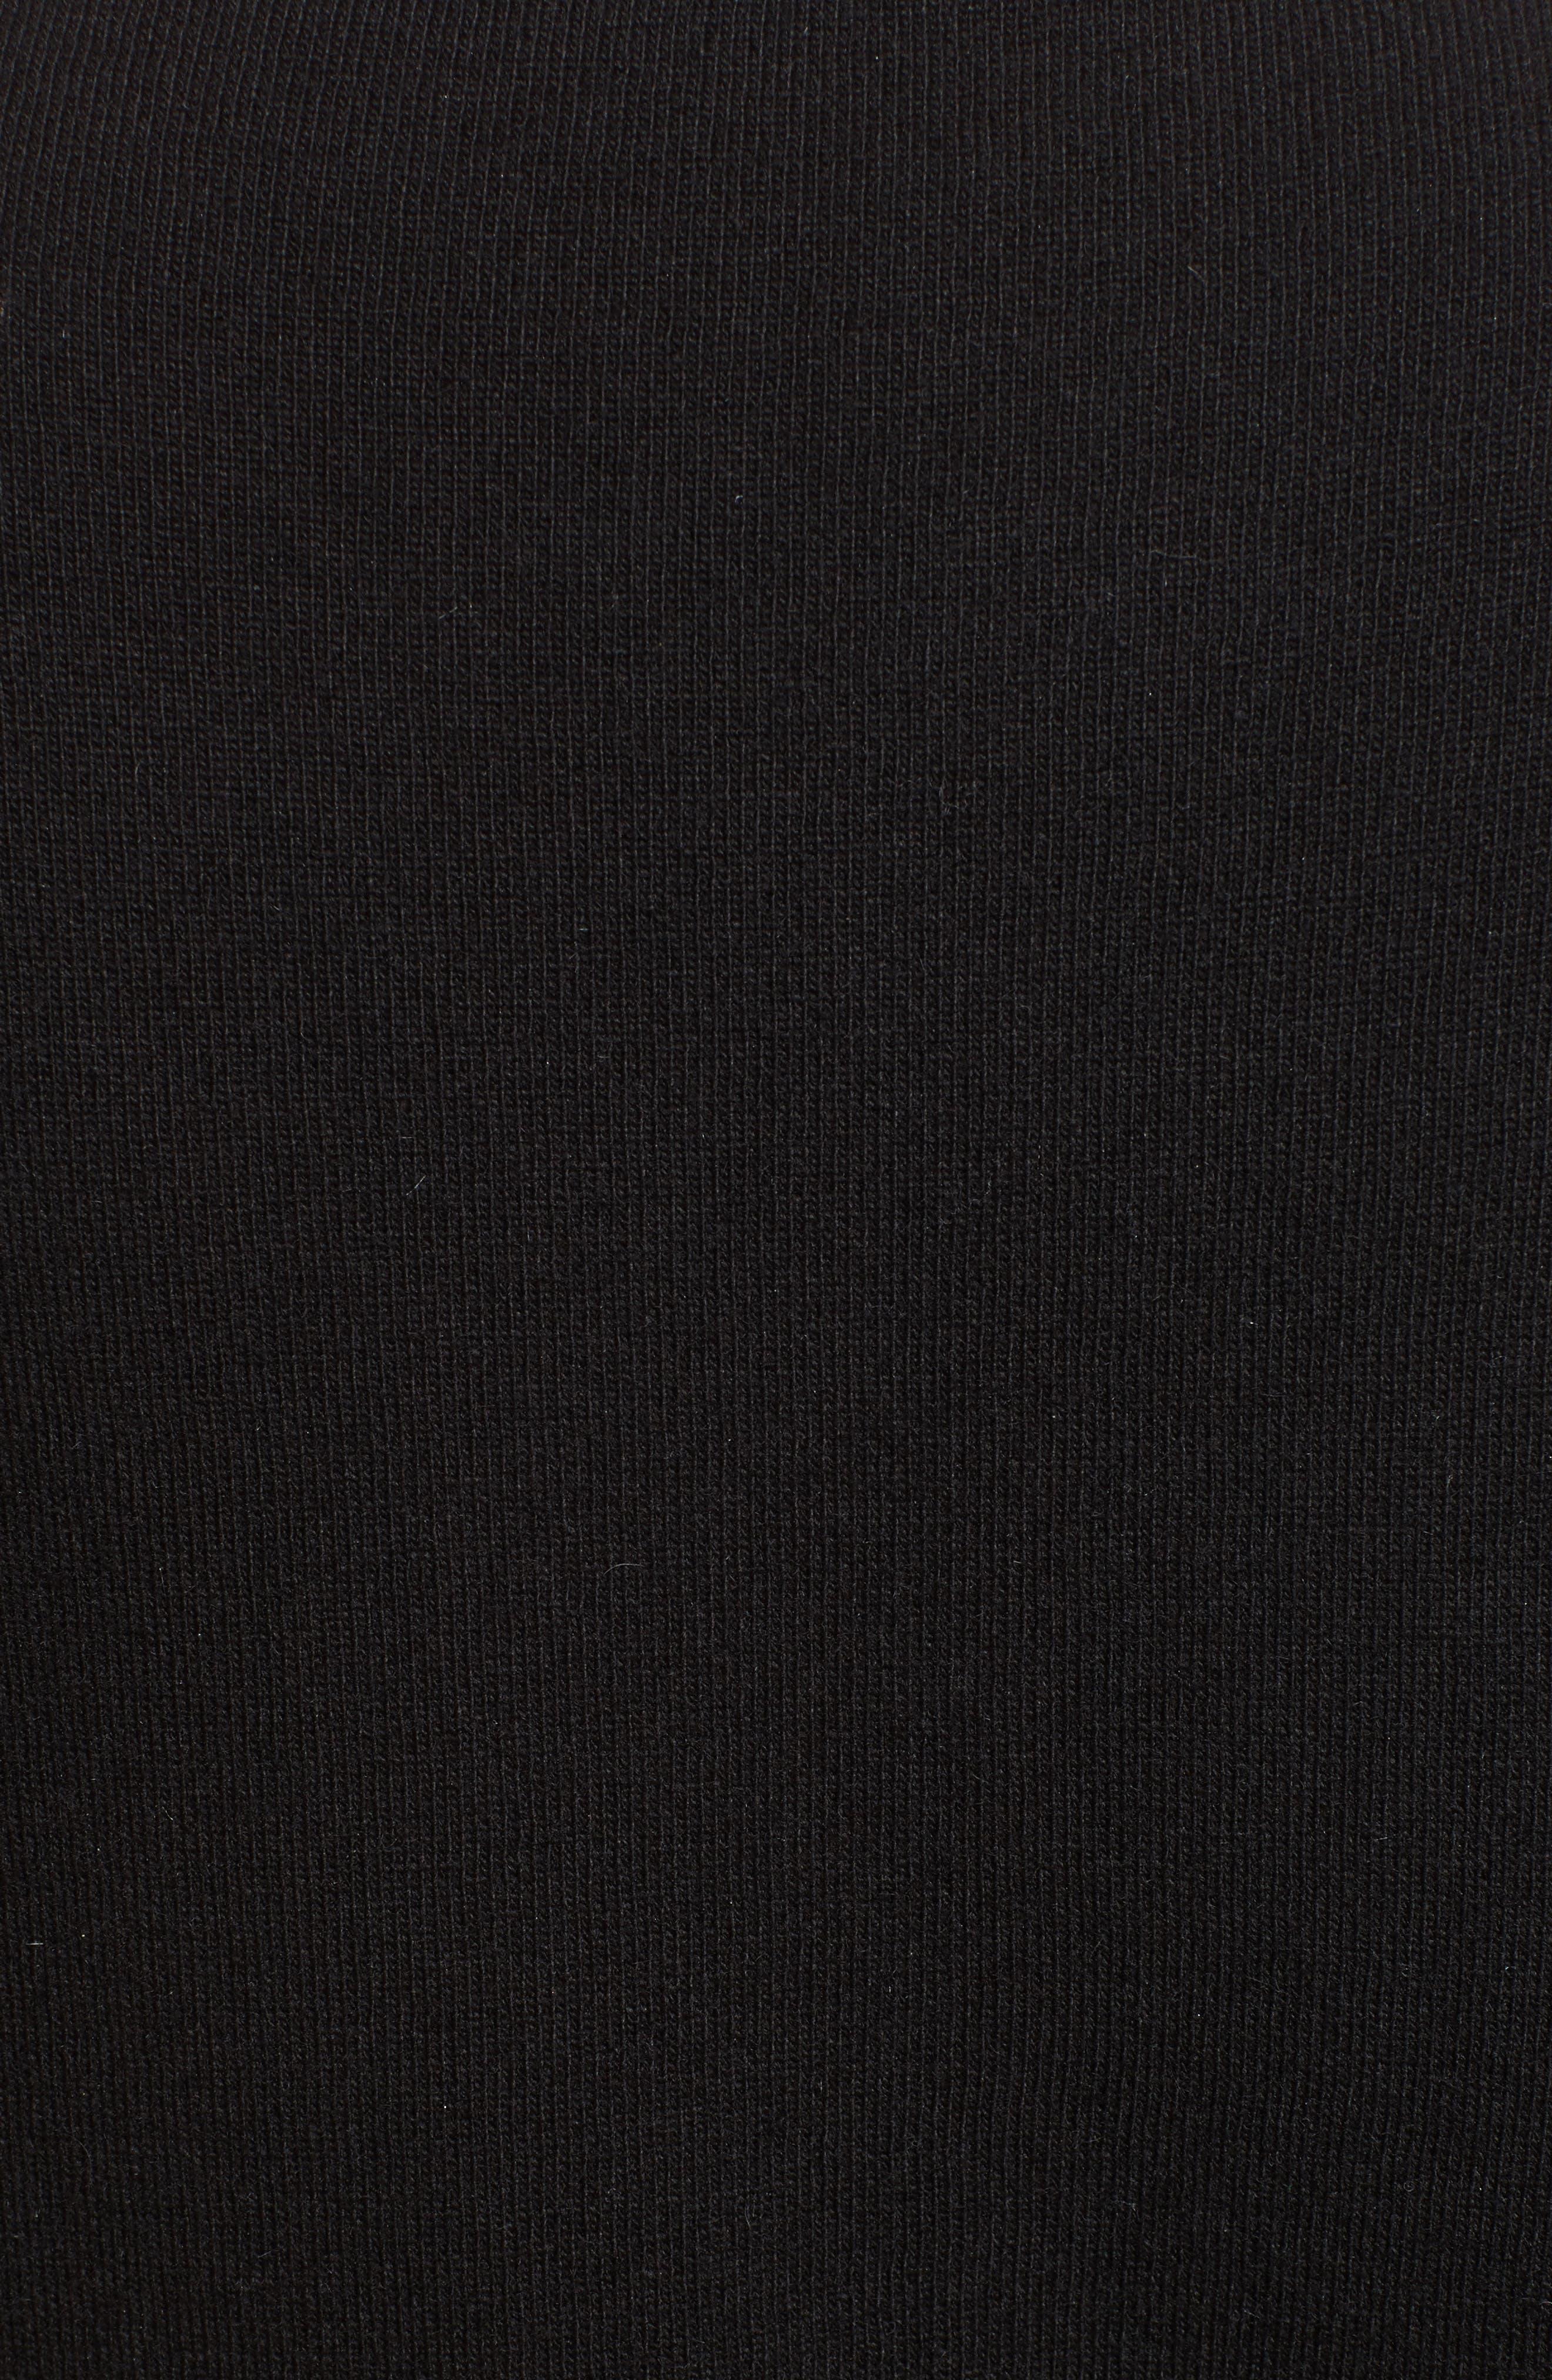 Tie Neck Star Sweater,                             Alternate thumbnail 5, color,                             Nero